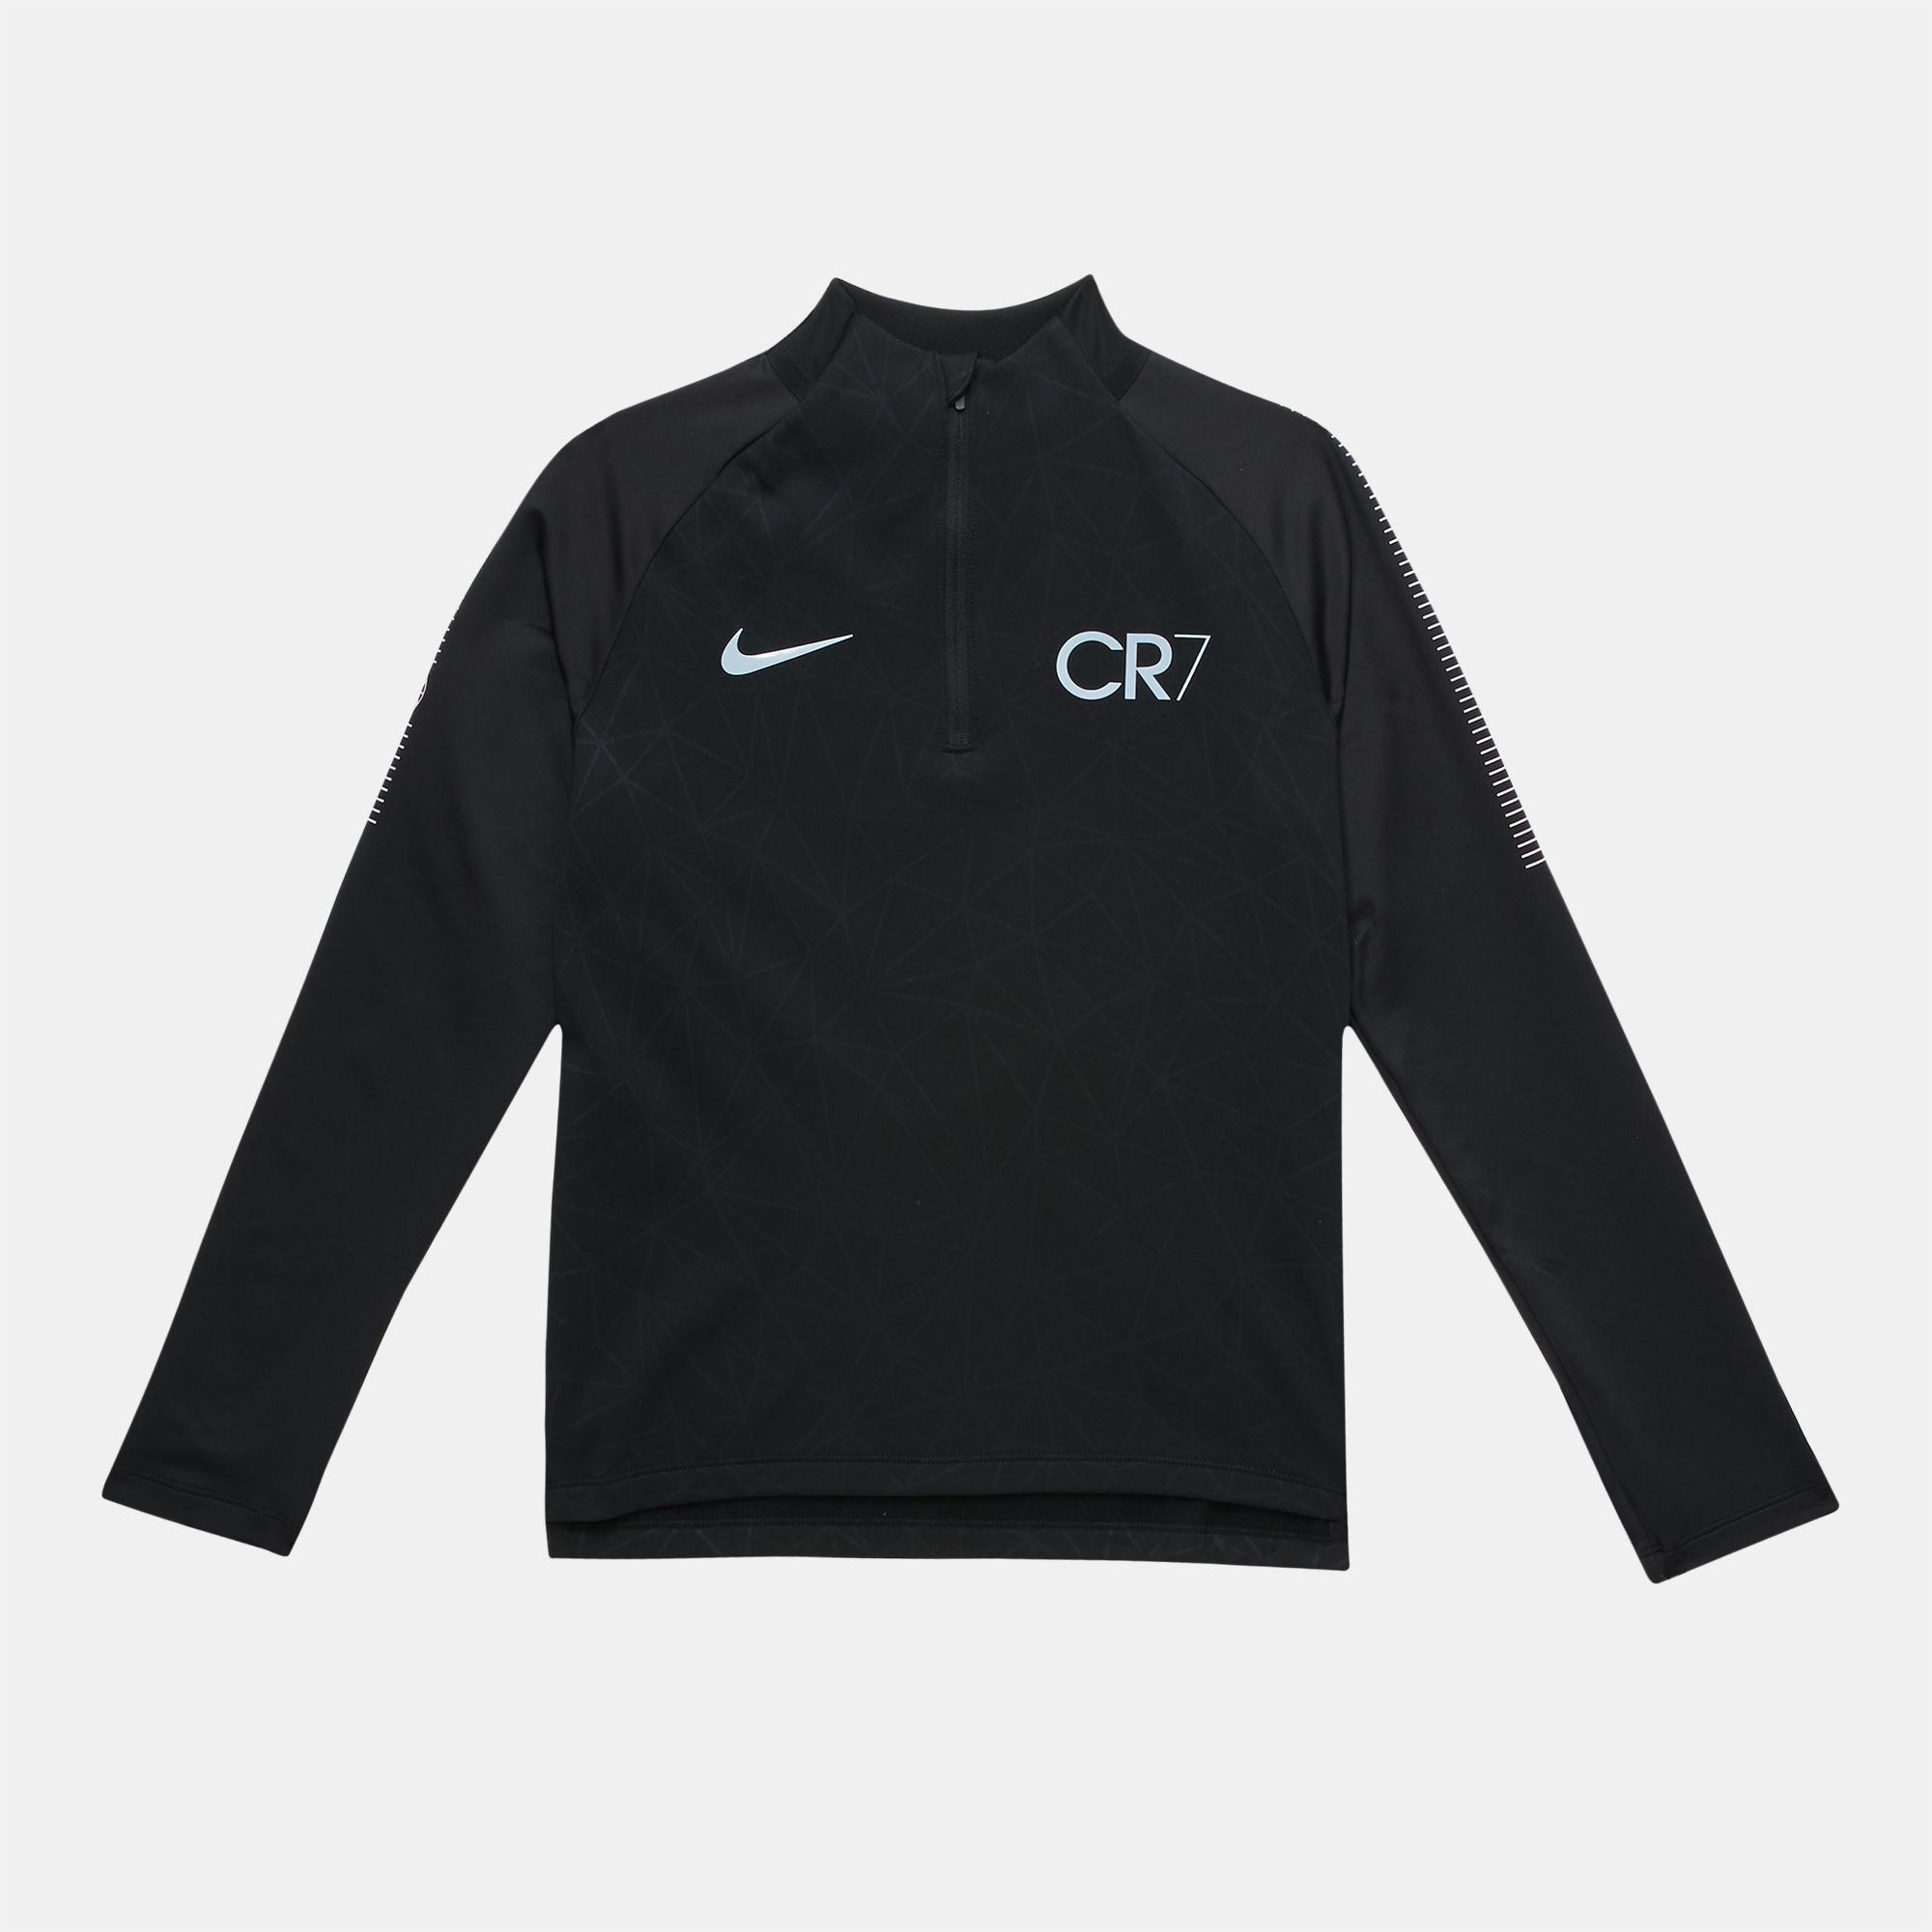 e9249e9381f6 Shop Black Nike Kid's Dry CR7 Squad Drill Long Sleeve Top for Kids ...